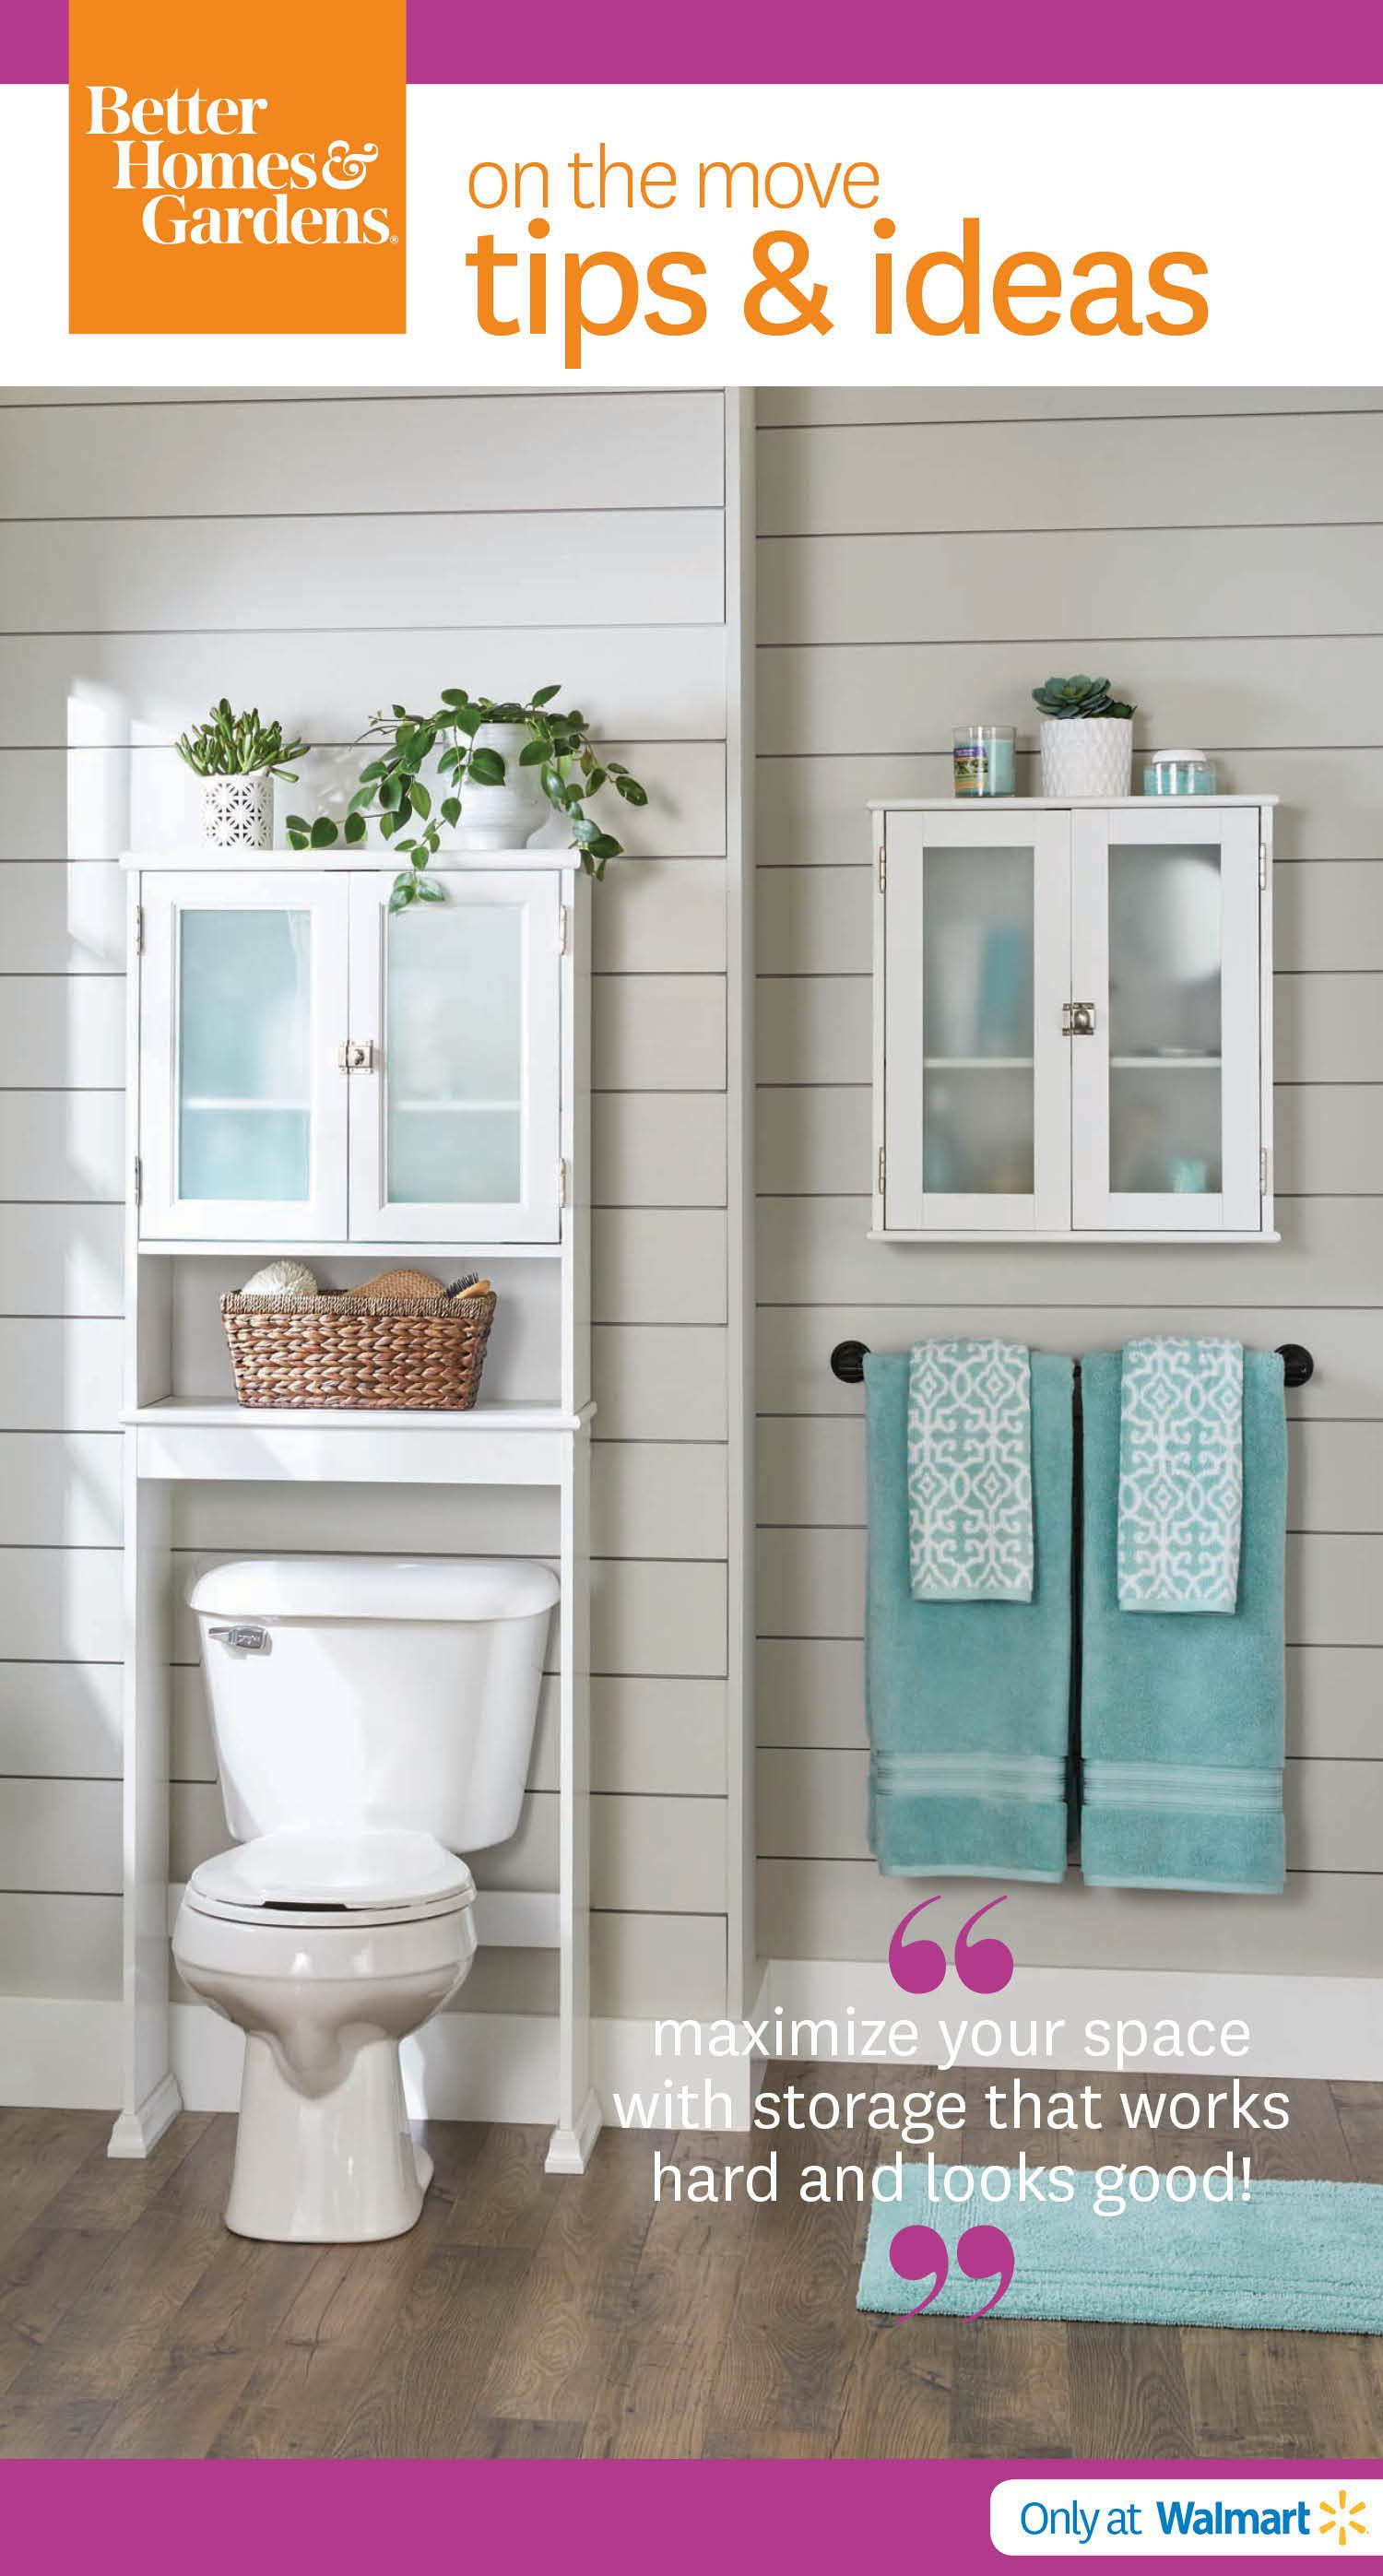 a713d5a1211329411d076a18b6d31de9 - Better Homes And Gardens Over The Toilet Bathroom Space Saver